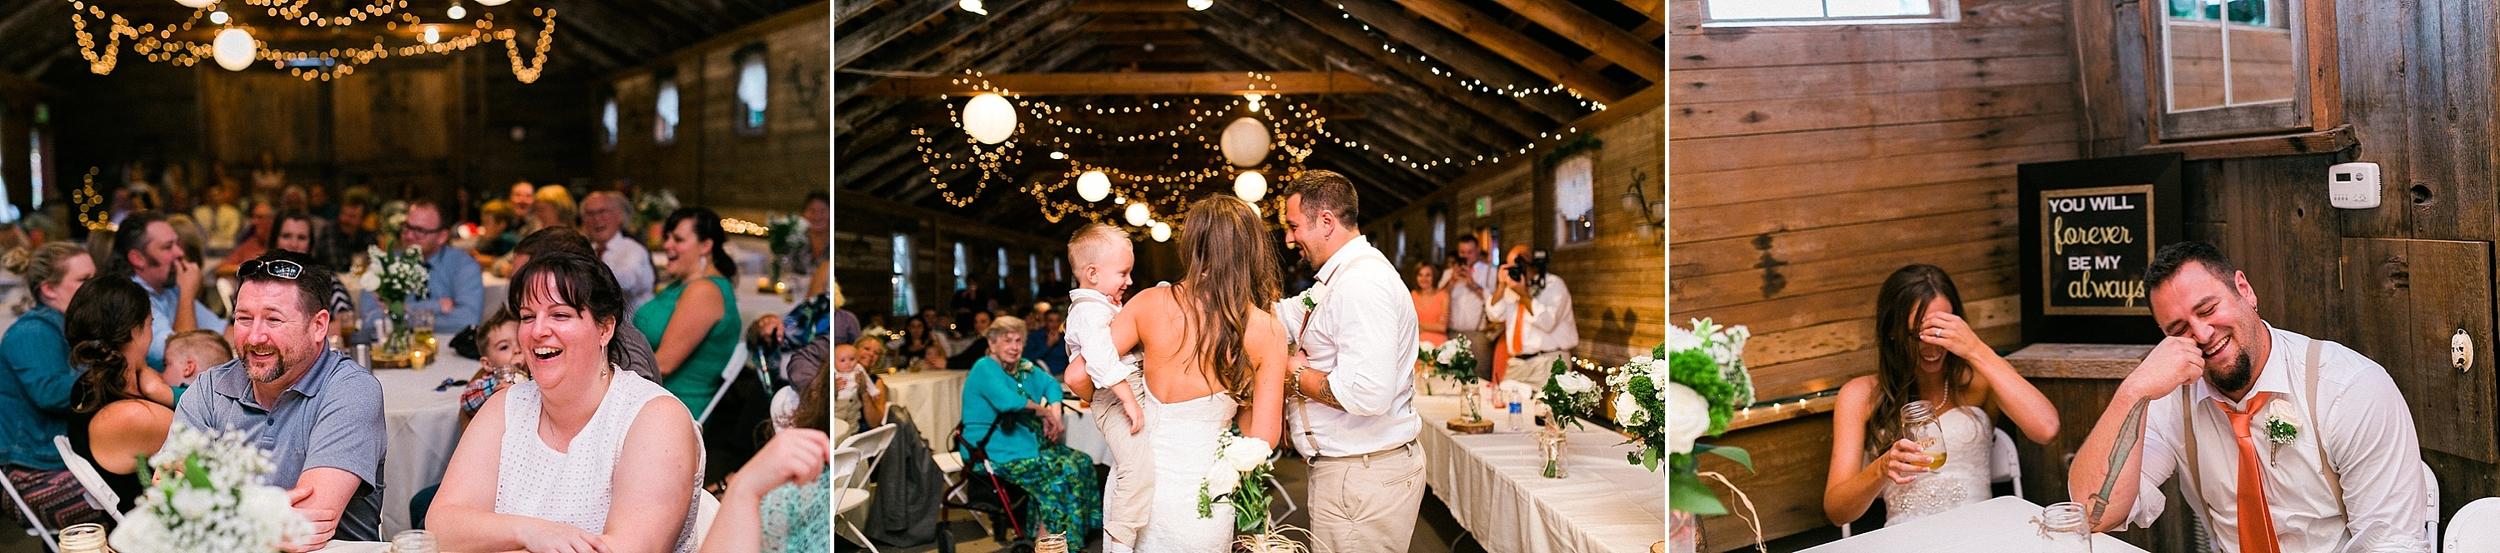 ashley vos photography seattle area wedding photographer_0741.jpg